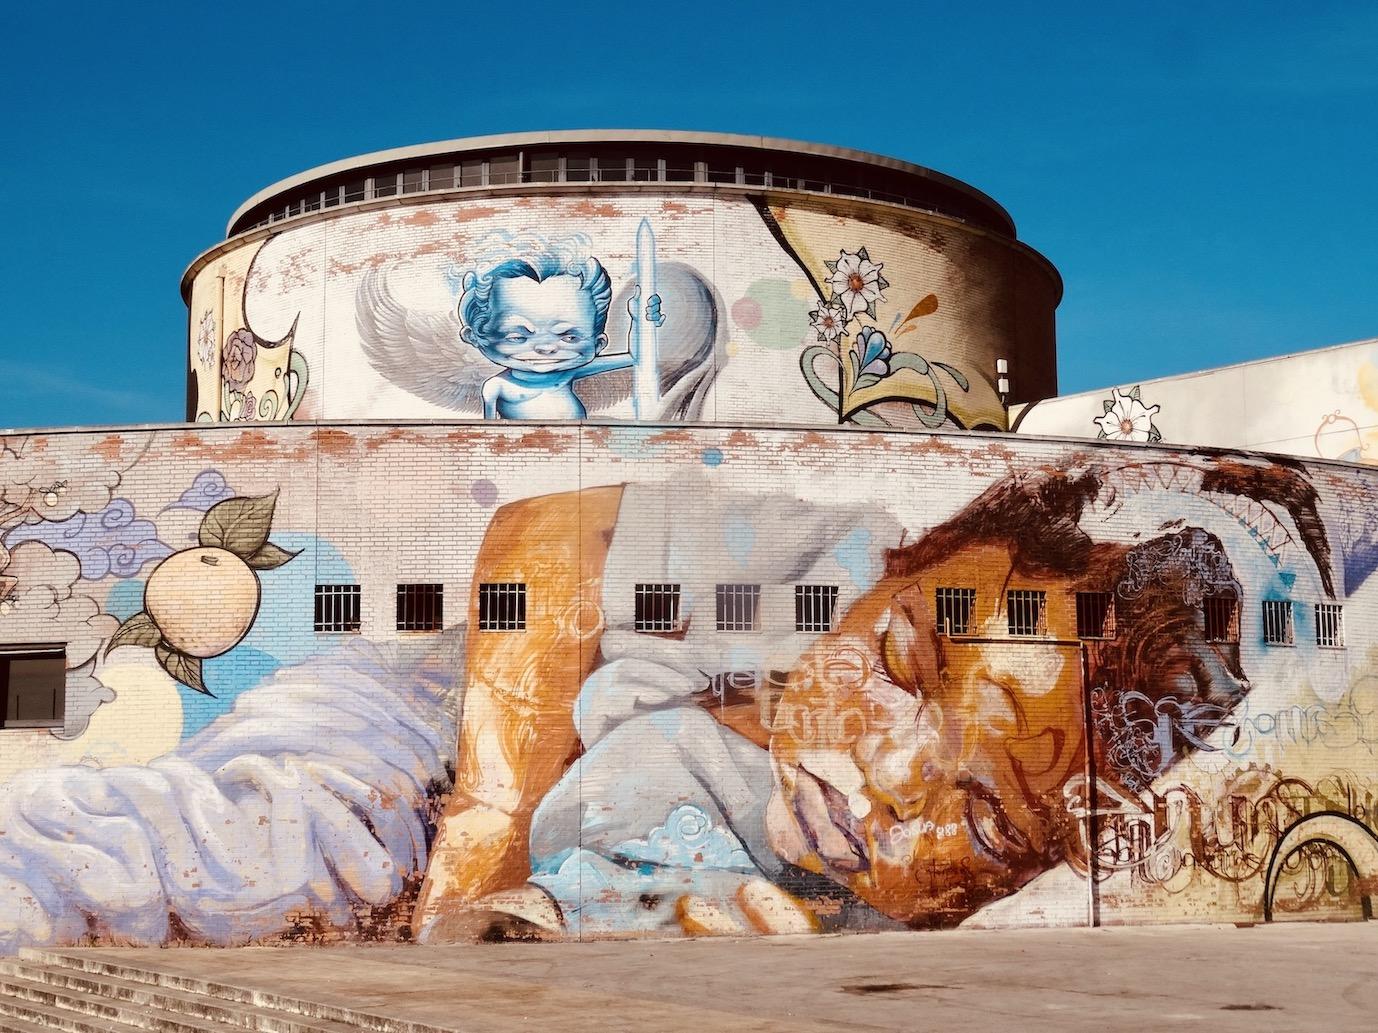 Graffiti in Seville.